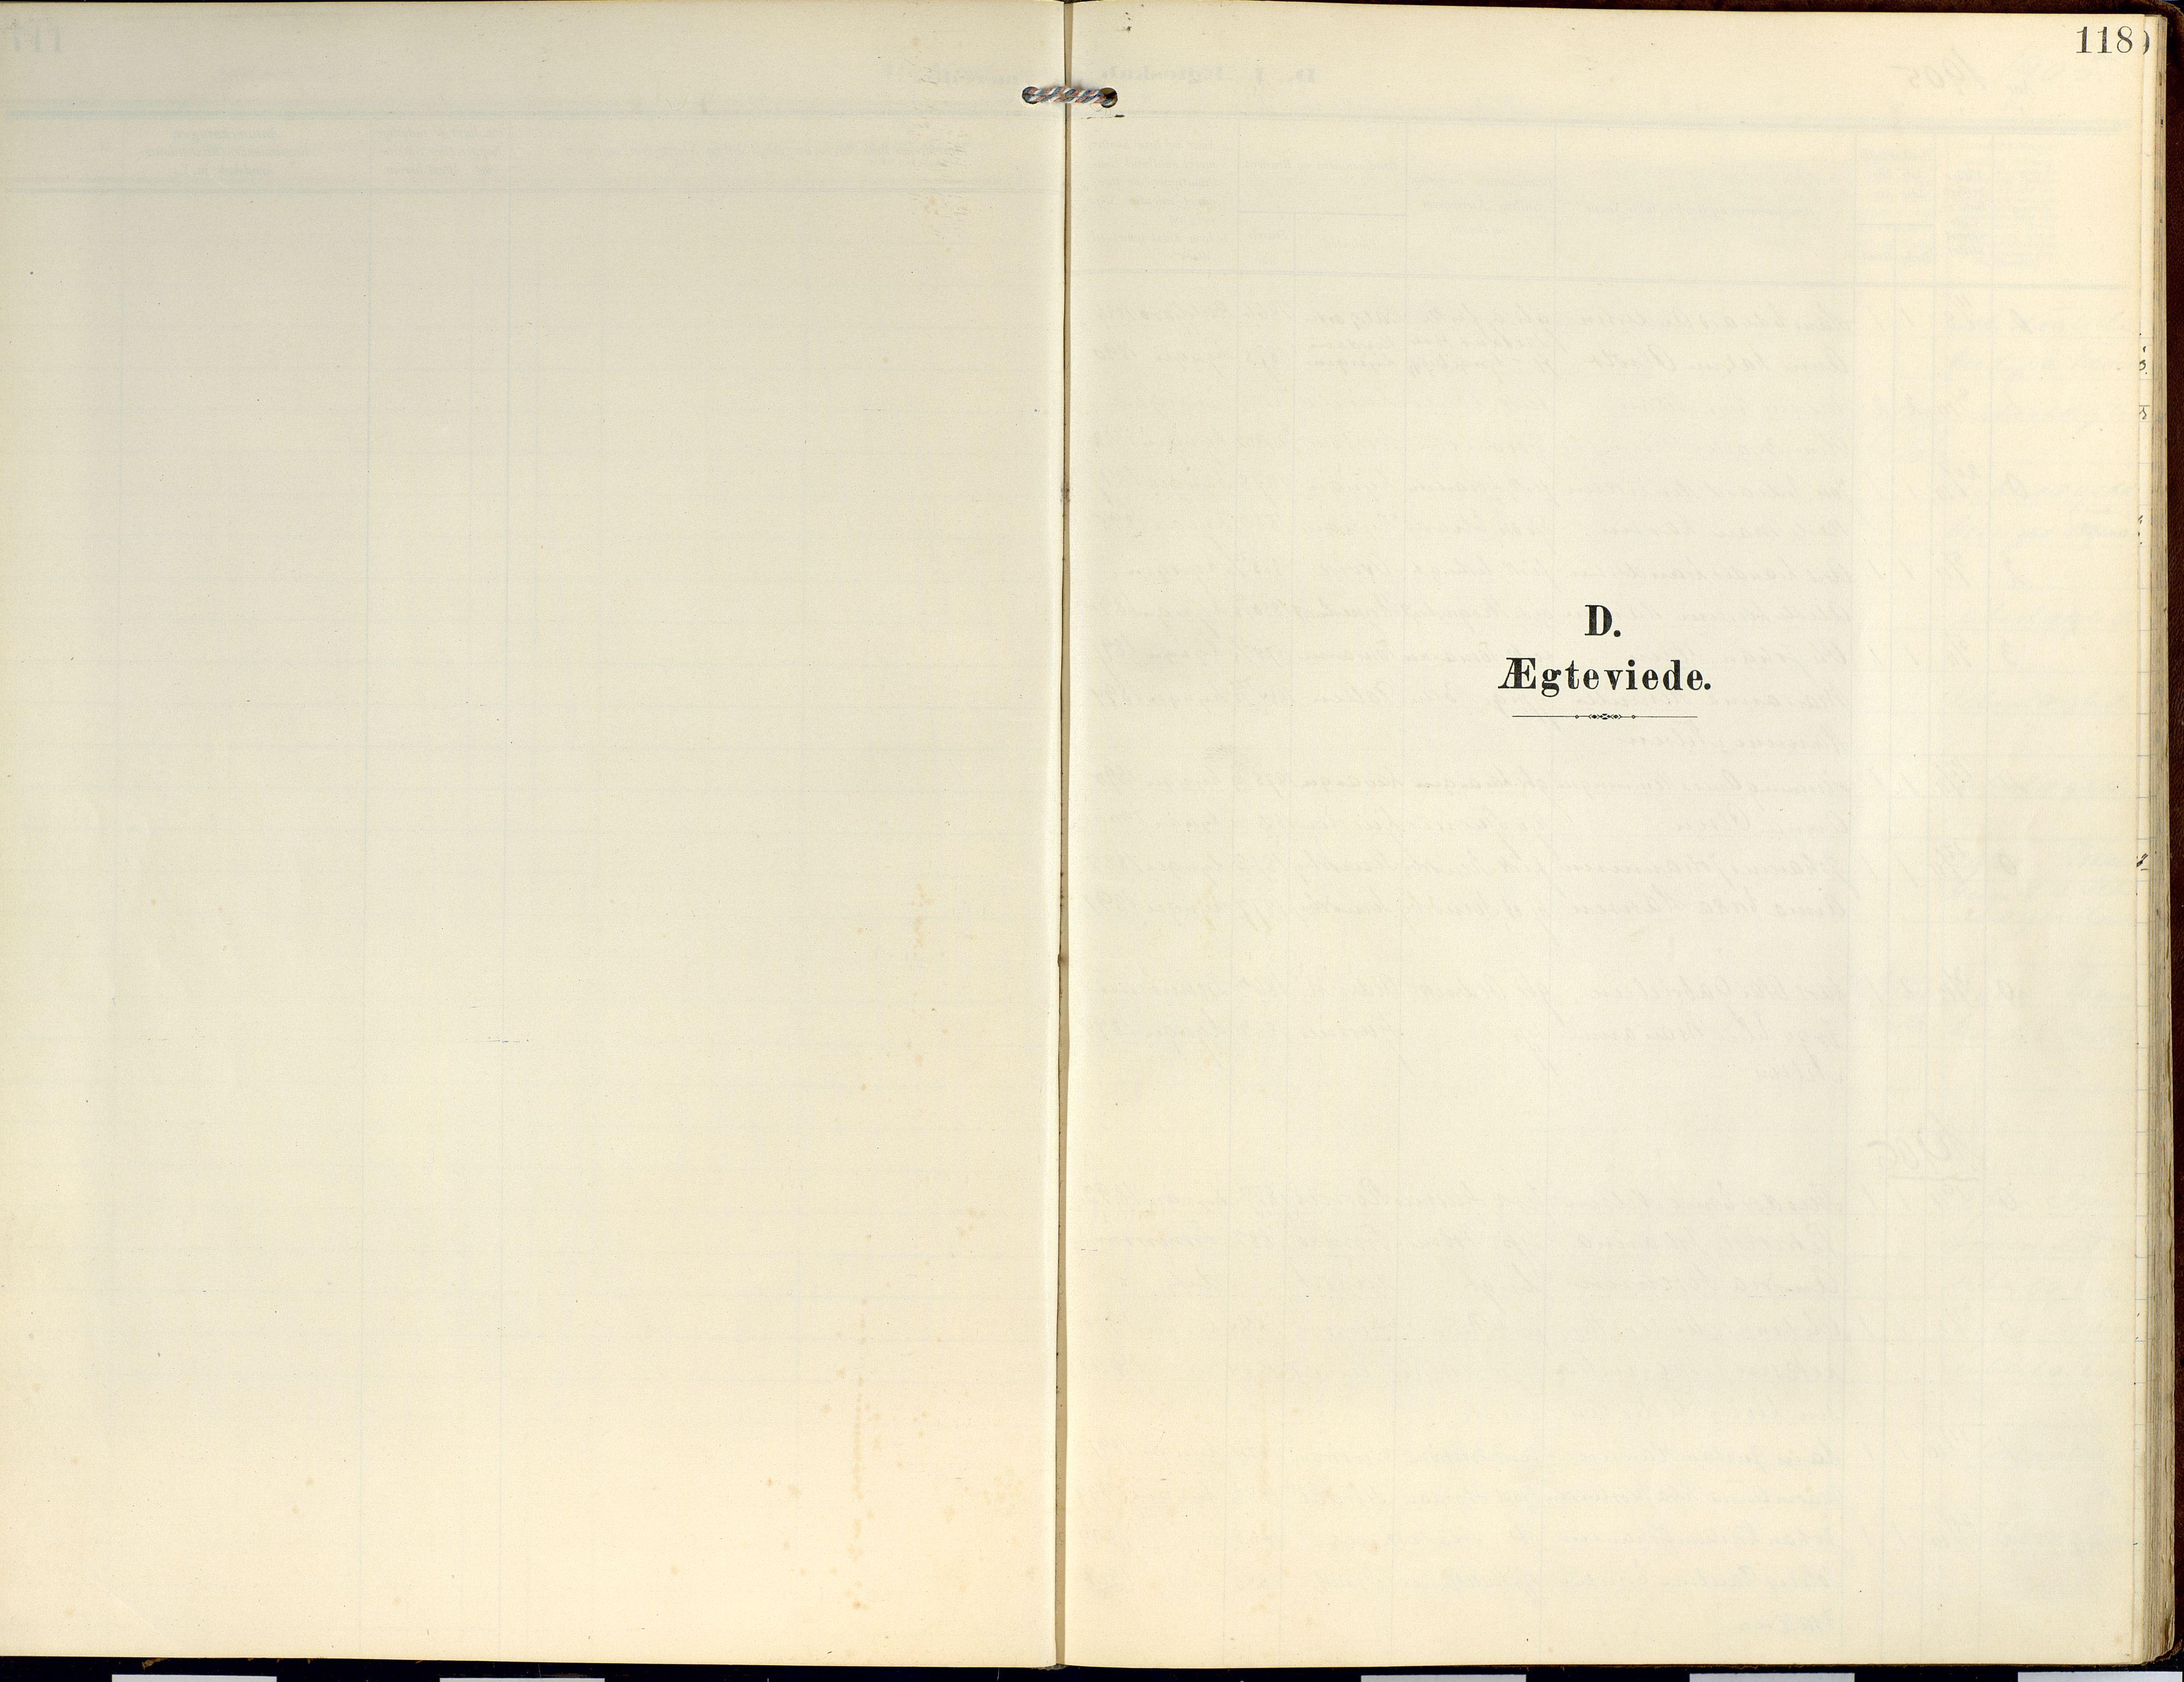 SATØ, Lyngen sokneprestembete, Ministerialbok nr. 14, 1905-1920, s. 118